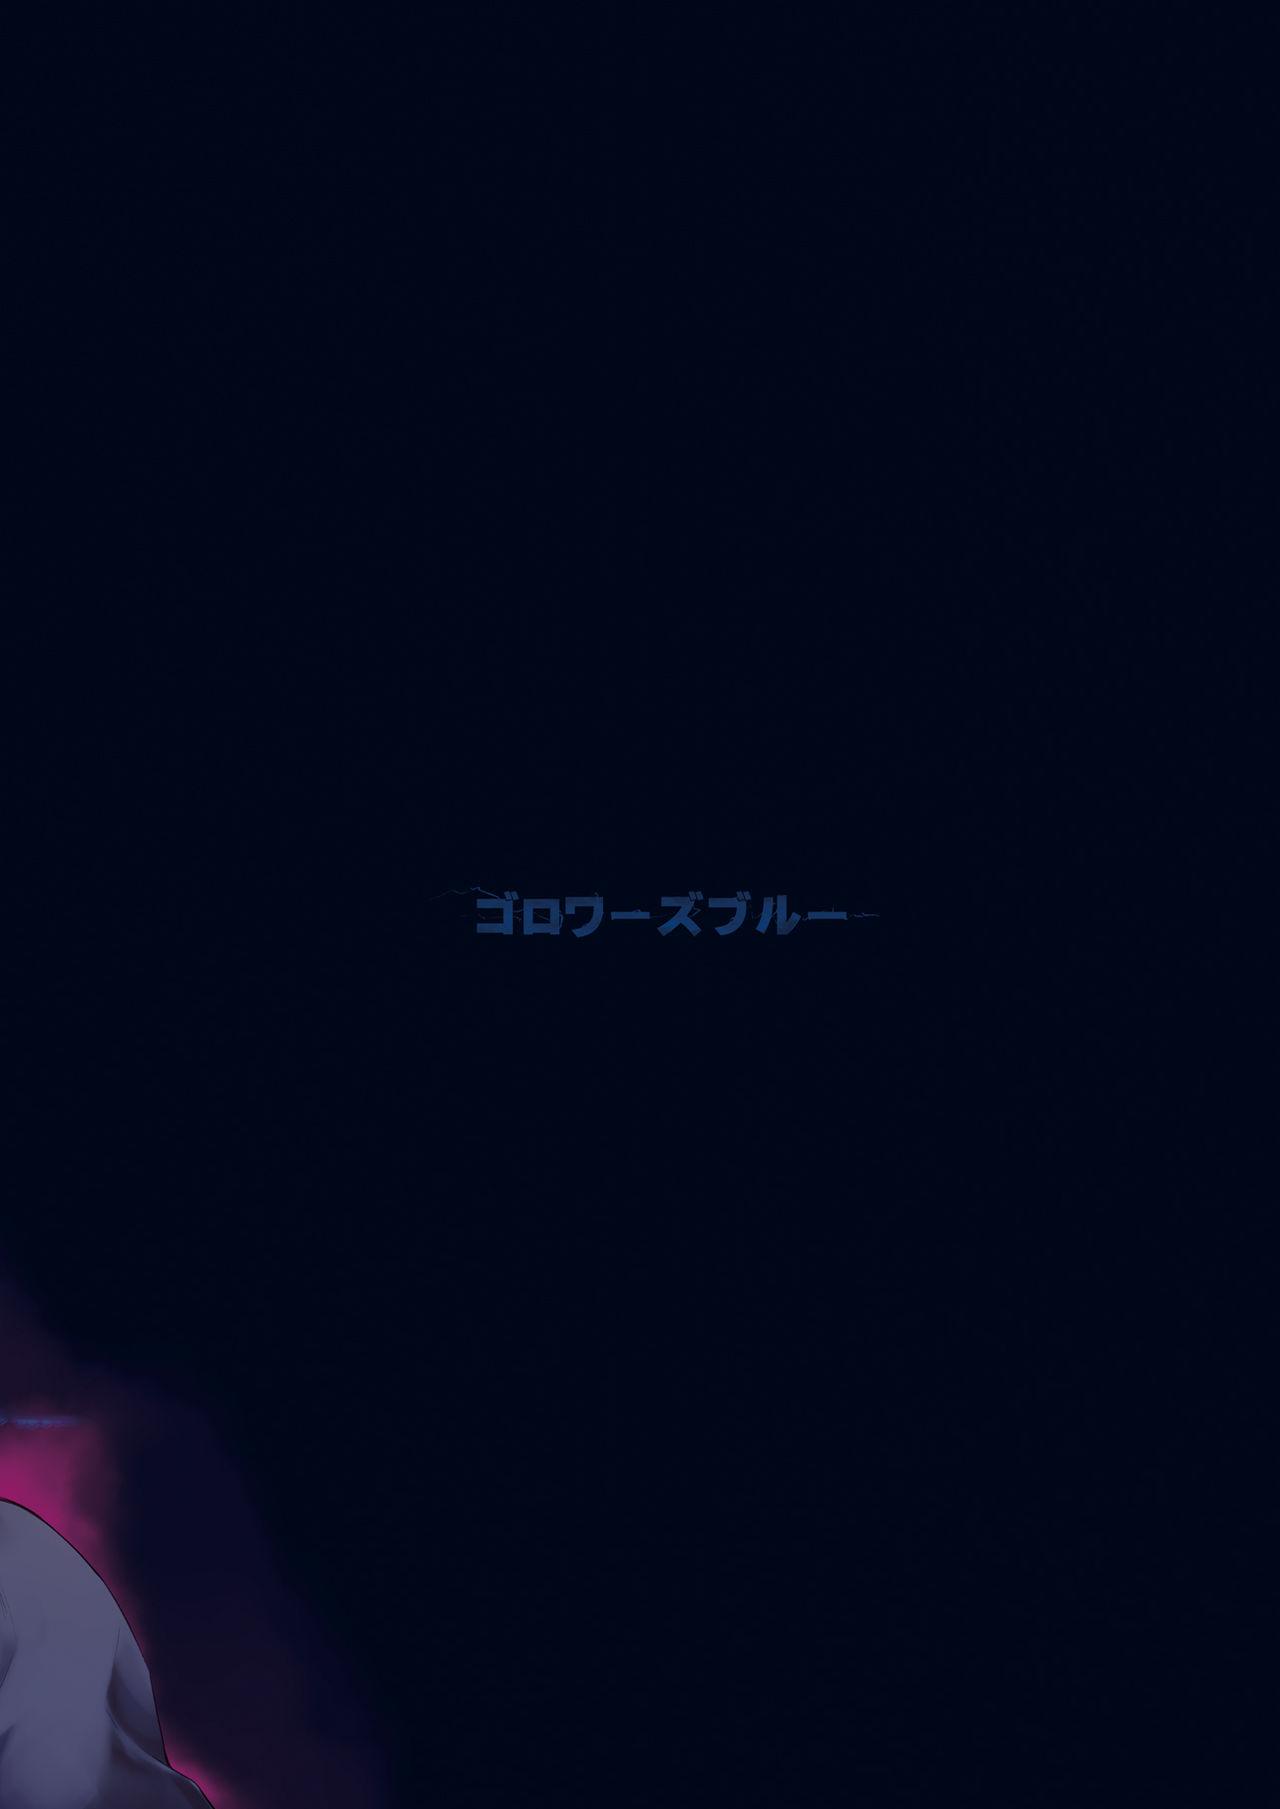 Shinjuku Gyakure Alter Knight Fate Grand Order Porn 26